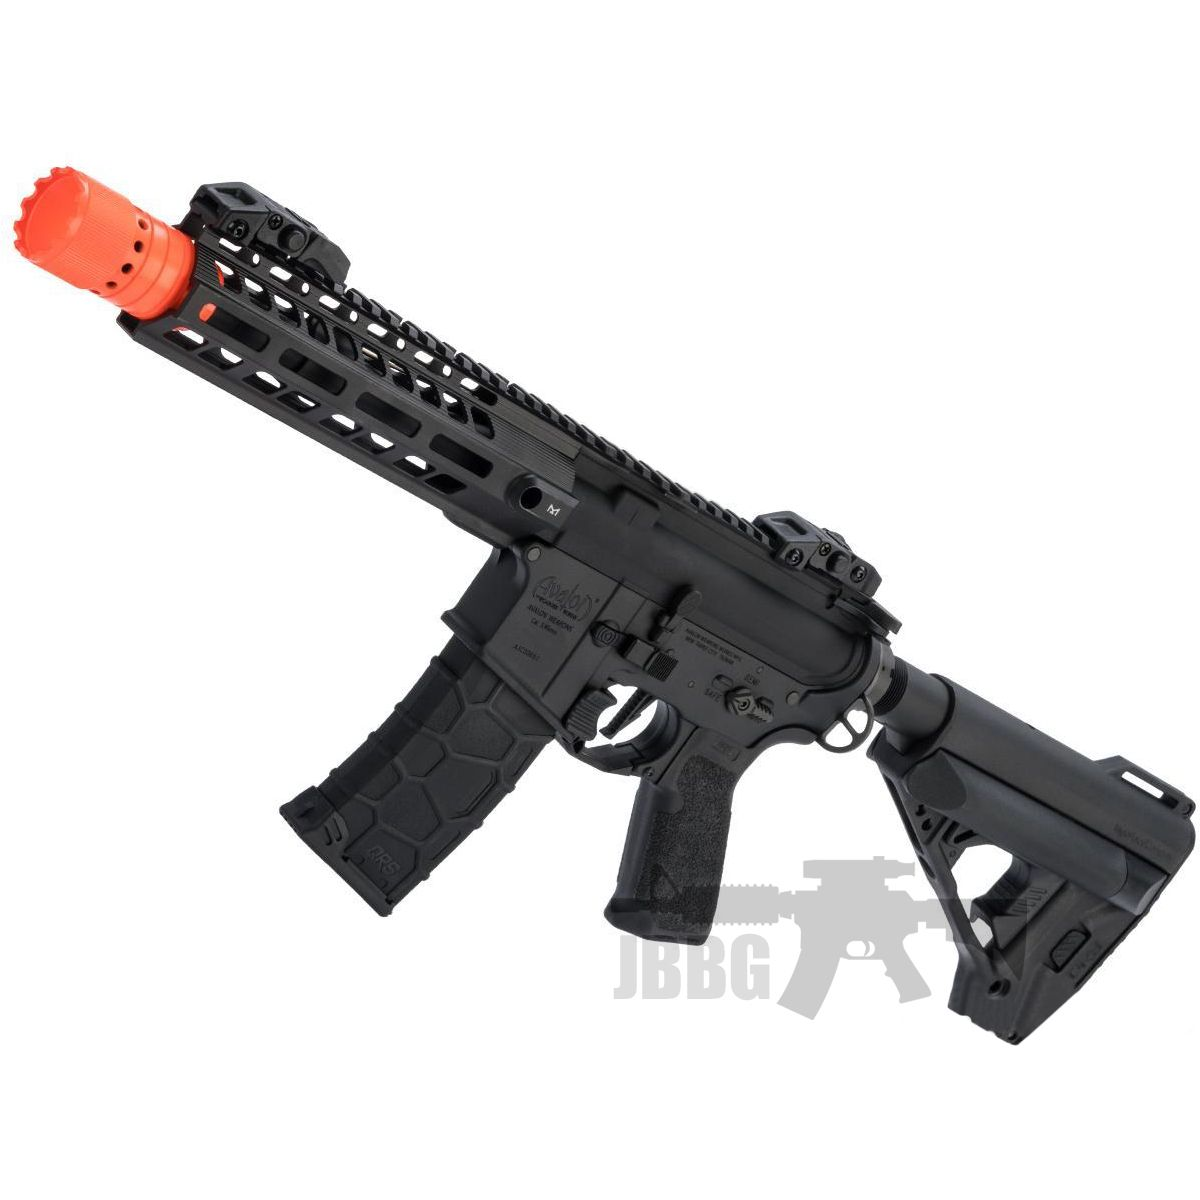 Elite Force VFC Avalon Gen2 VR16 Saber CQB M4 Airsoft Gun